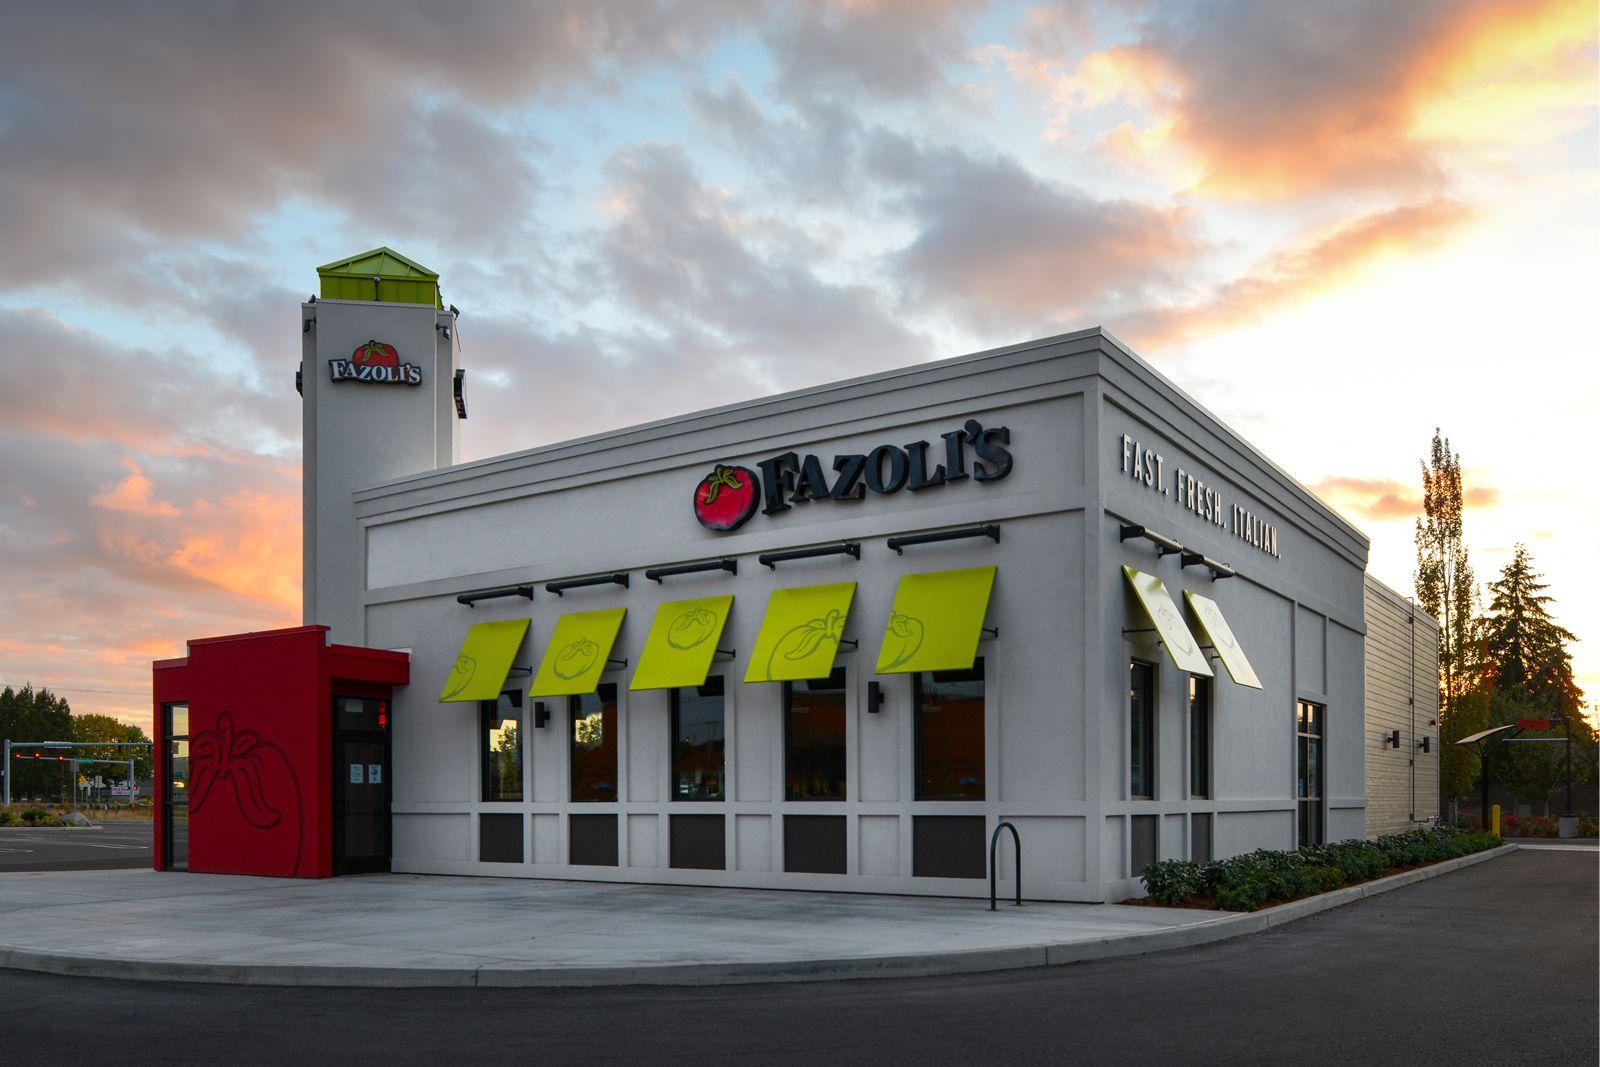 Fazoli's Prepares to Serve its Acclaimed, Signature Italian Dishes in Cartersville